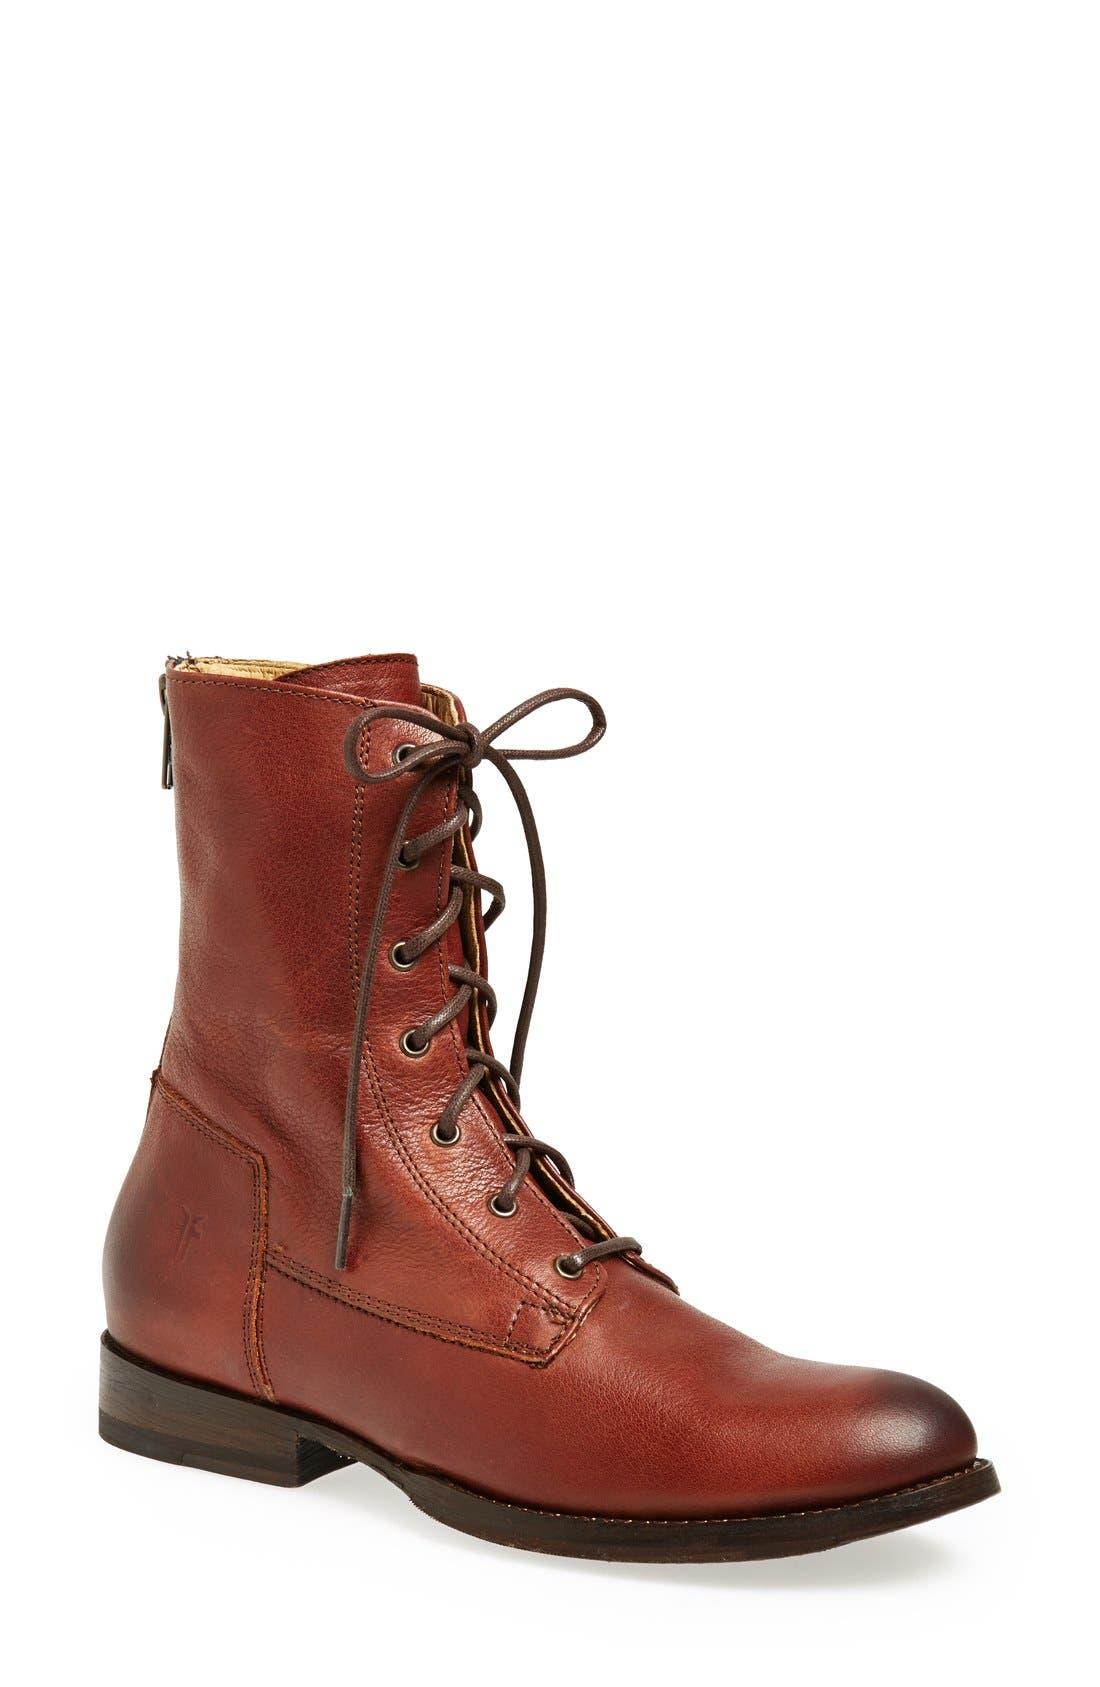 Main Image - Frye 'Jamie Artisan' Boot (Women)